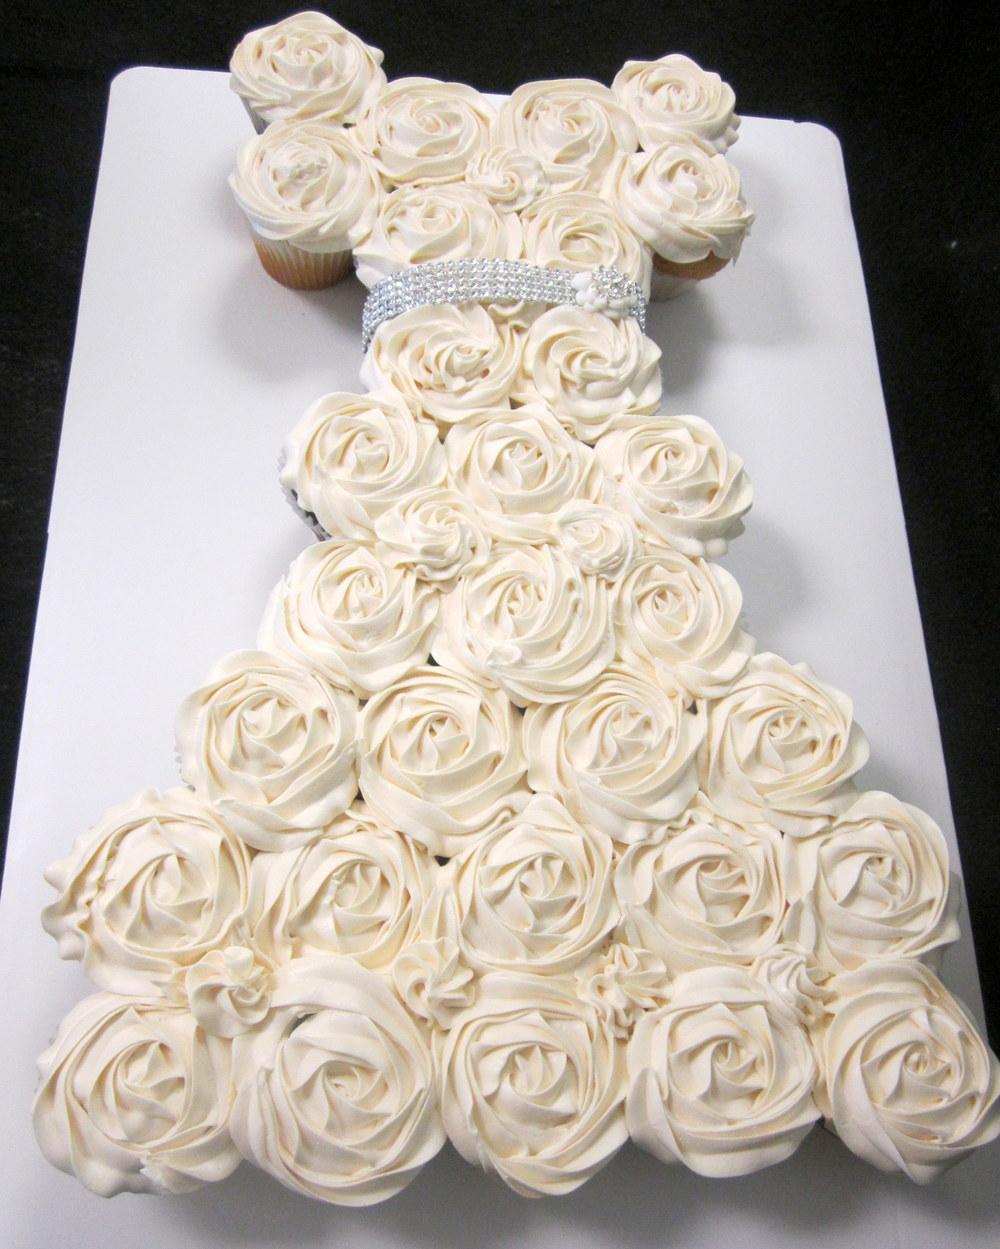 cupcakes-brides dress.JPG